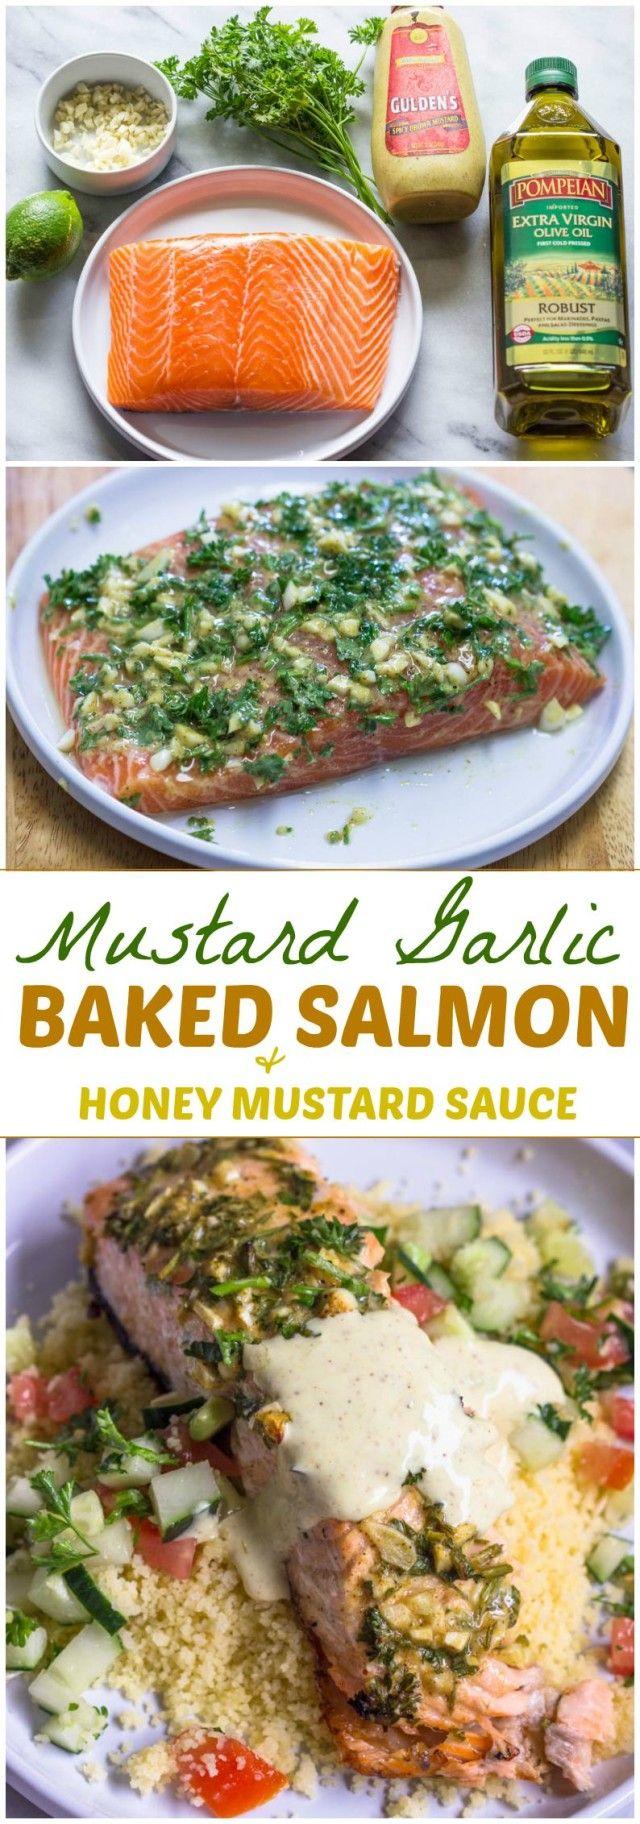 Baked Mustard Garlic Salmon with Honey Mustard Sauce